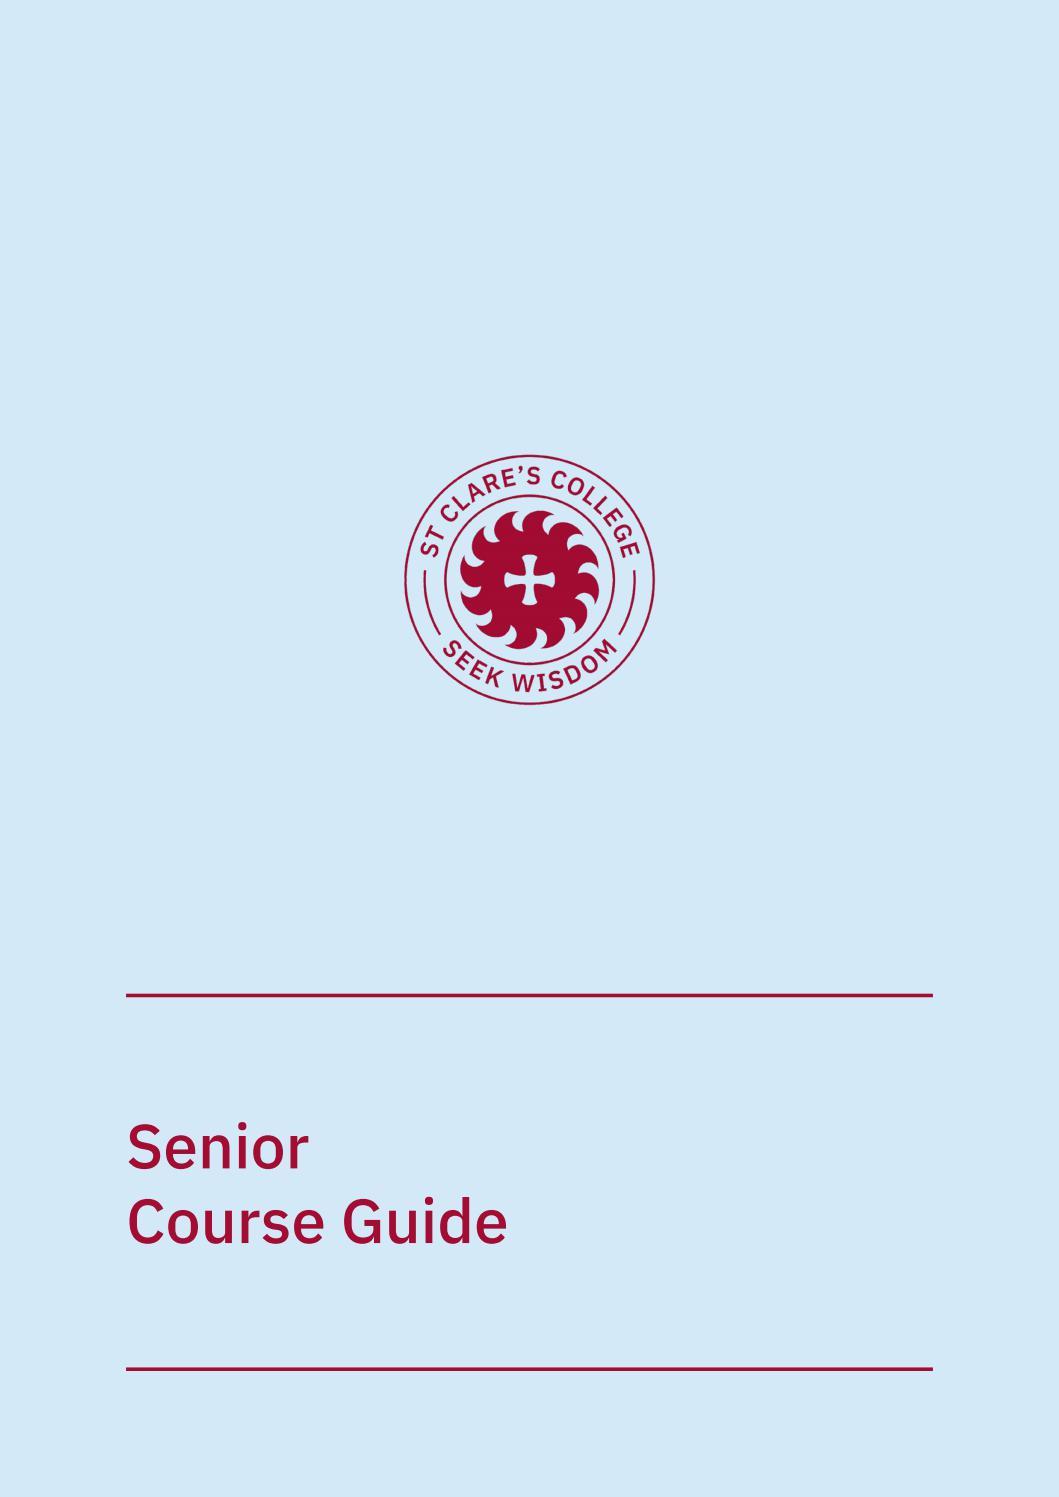 Senior Course Guide